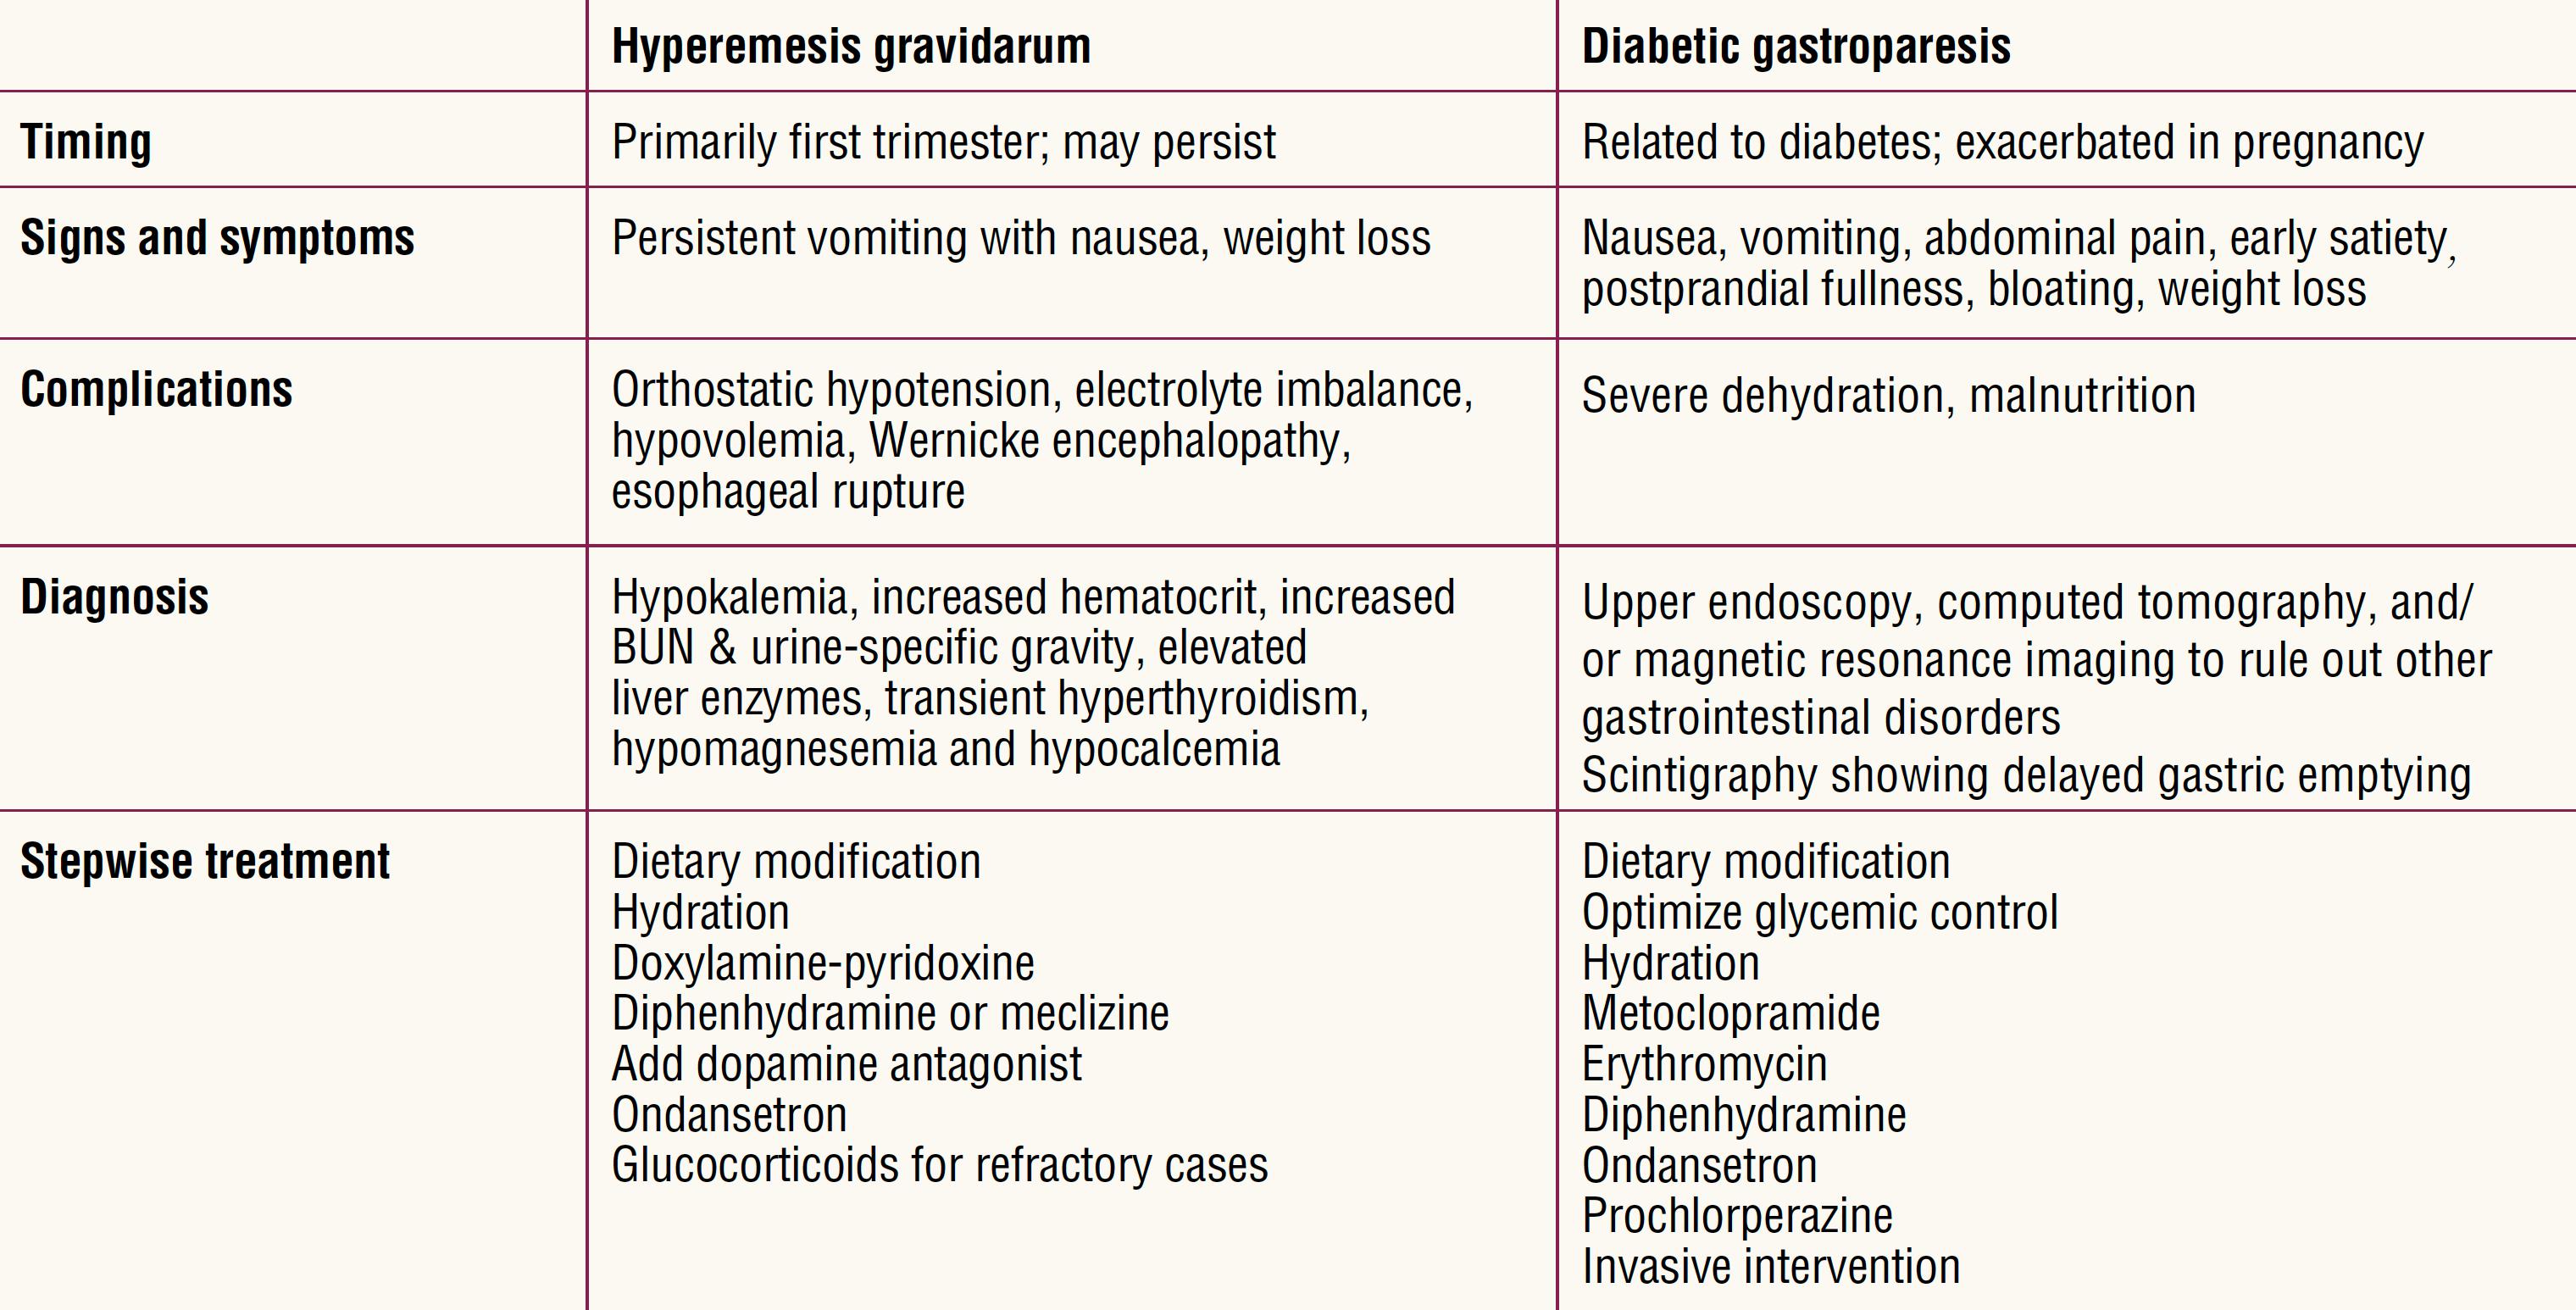 diabetic-gastropharesis-pregnancy-table1